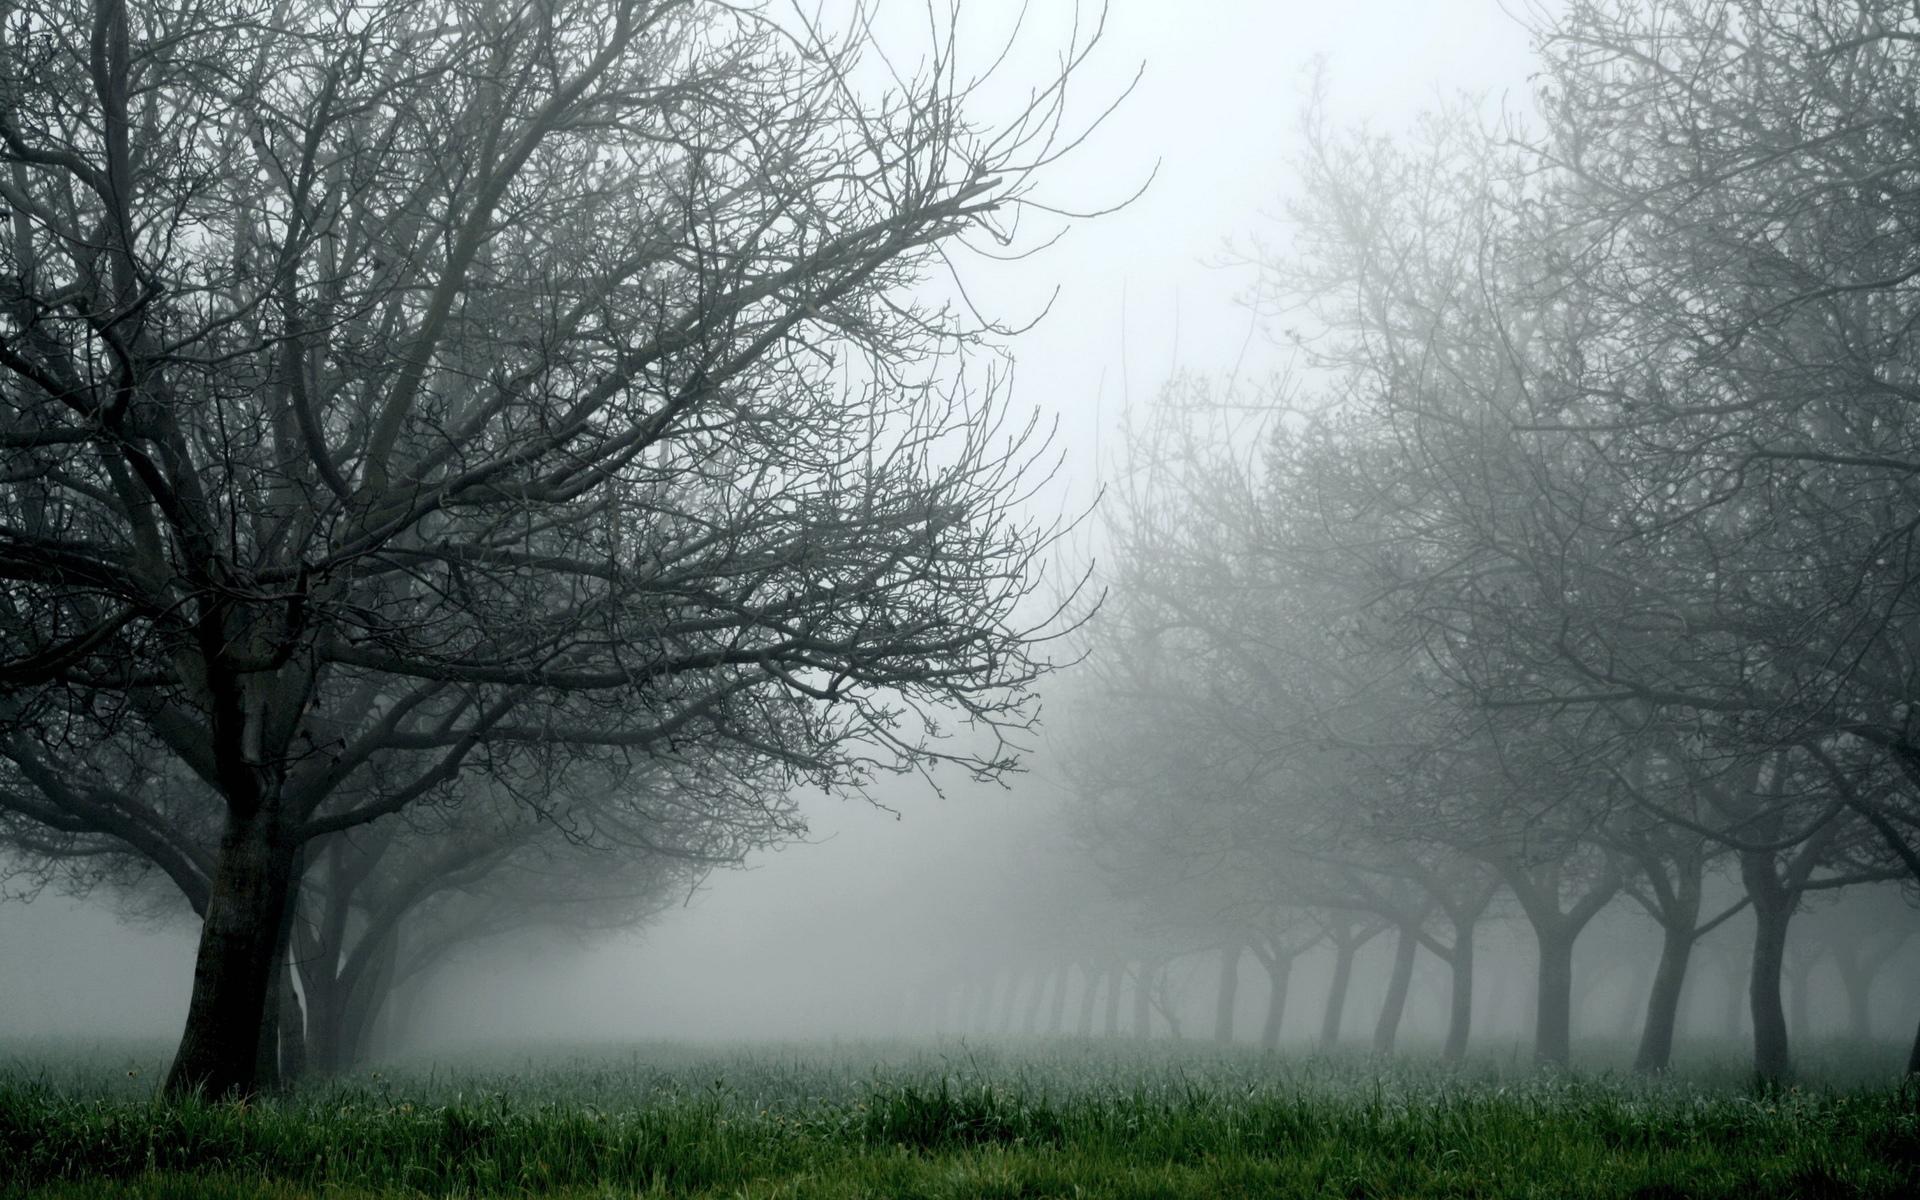 landscapes trees fog - photo #29